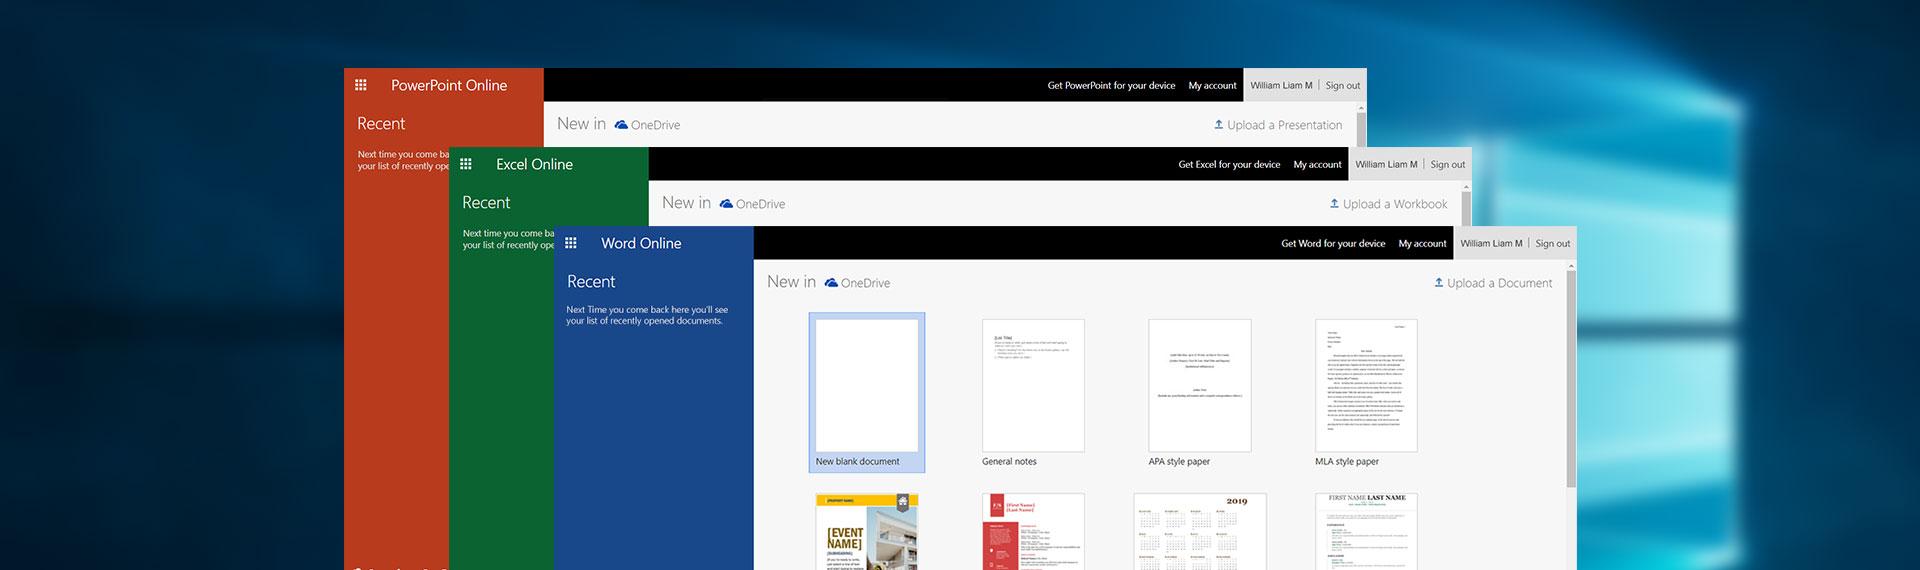 Masih Bingung Cara Menggunakan Office 365? Baca Tips-tips Ini Dulu!